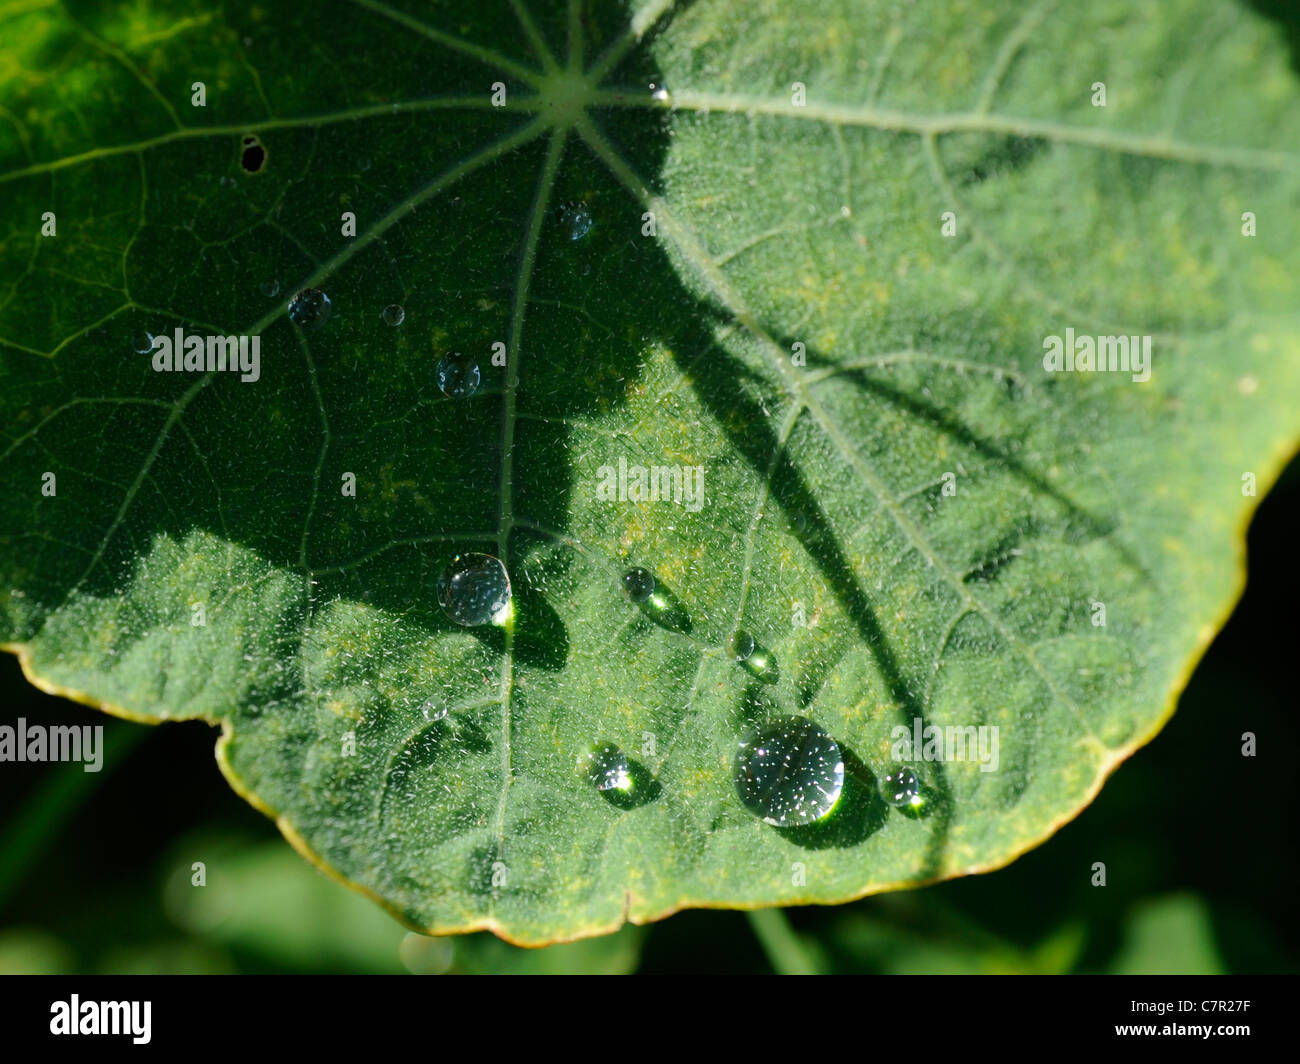 Gotas de agua sobre una hoja nasturtium Imagen De Stock